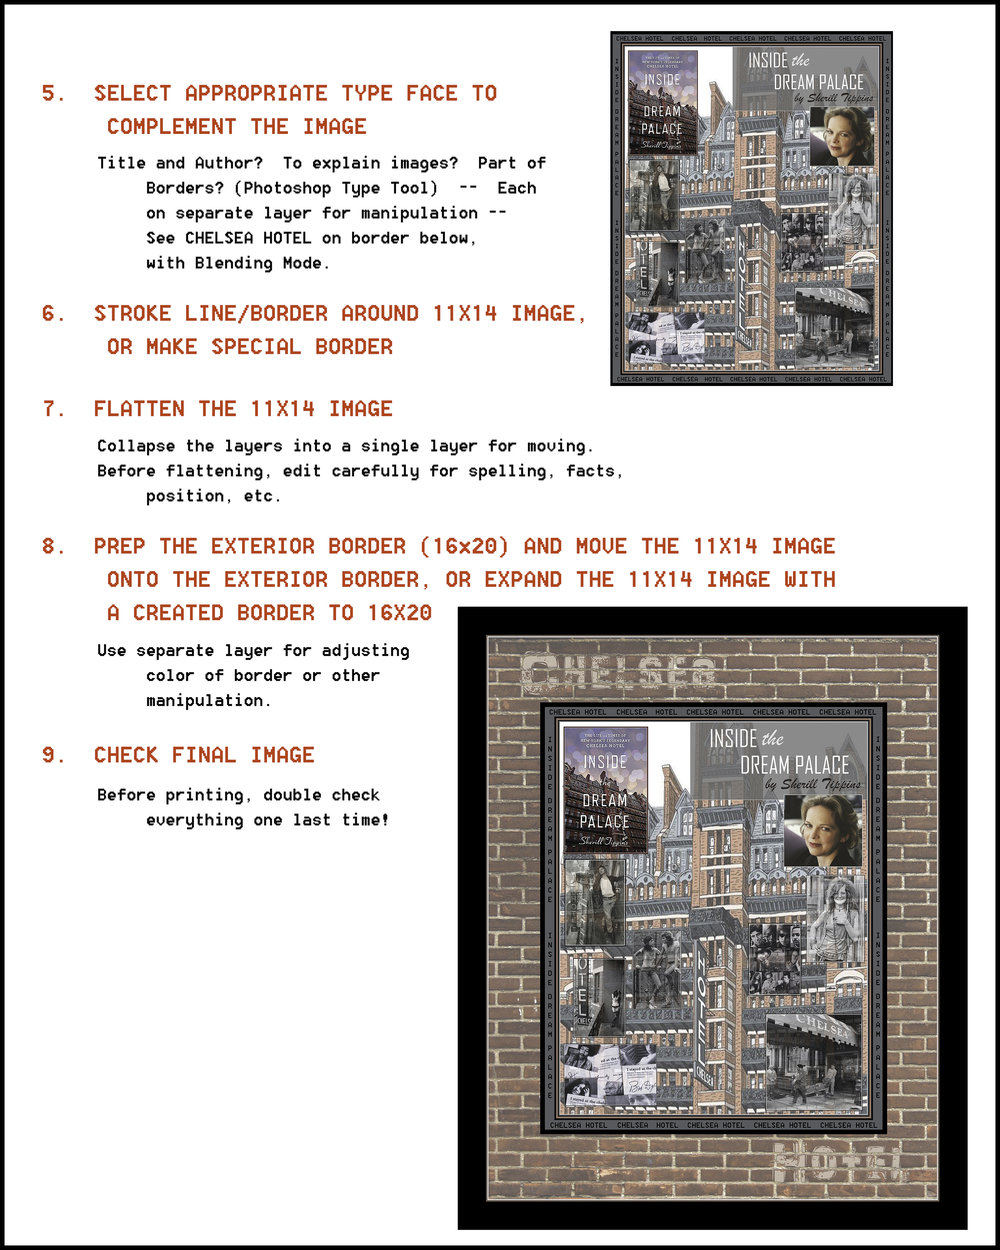 DK Book Club Compositing-4.jpg